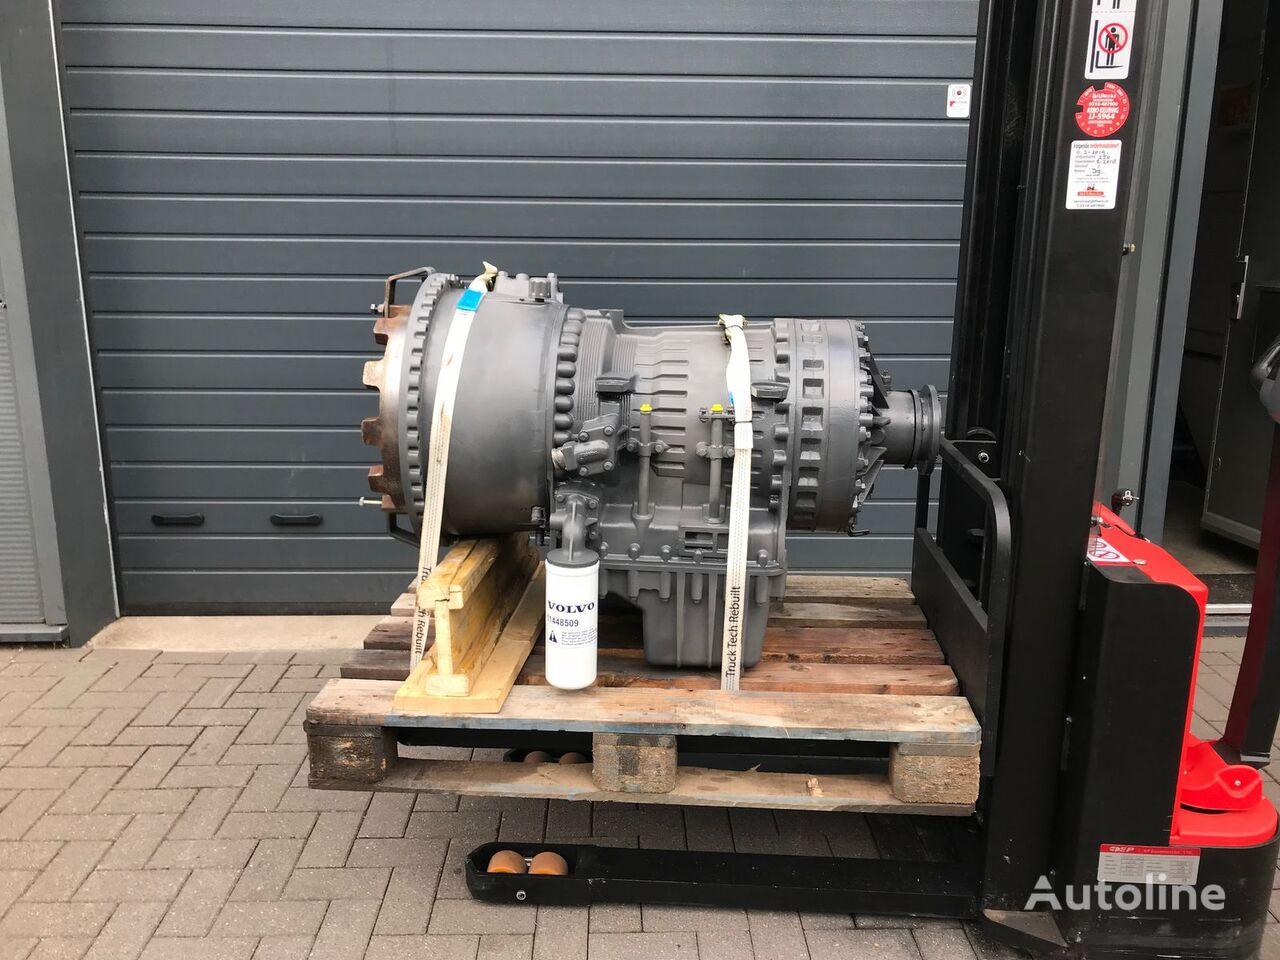 new VOLVO PT1862 22640 22650 gearbox for VOLVO knikdumper wheel loader